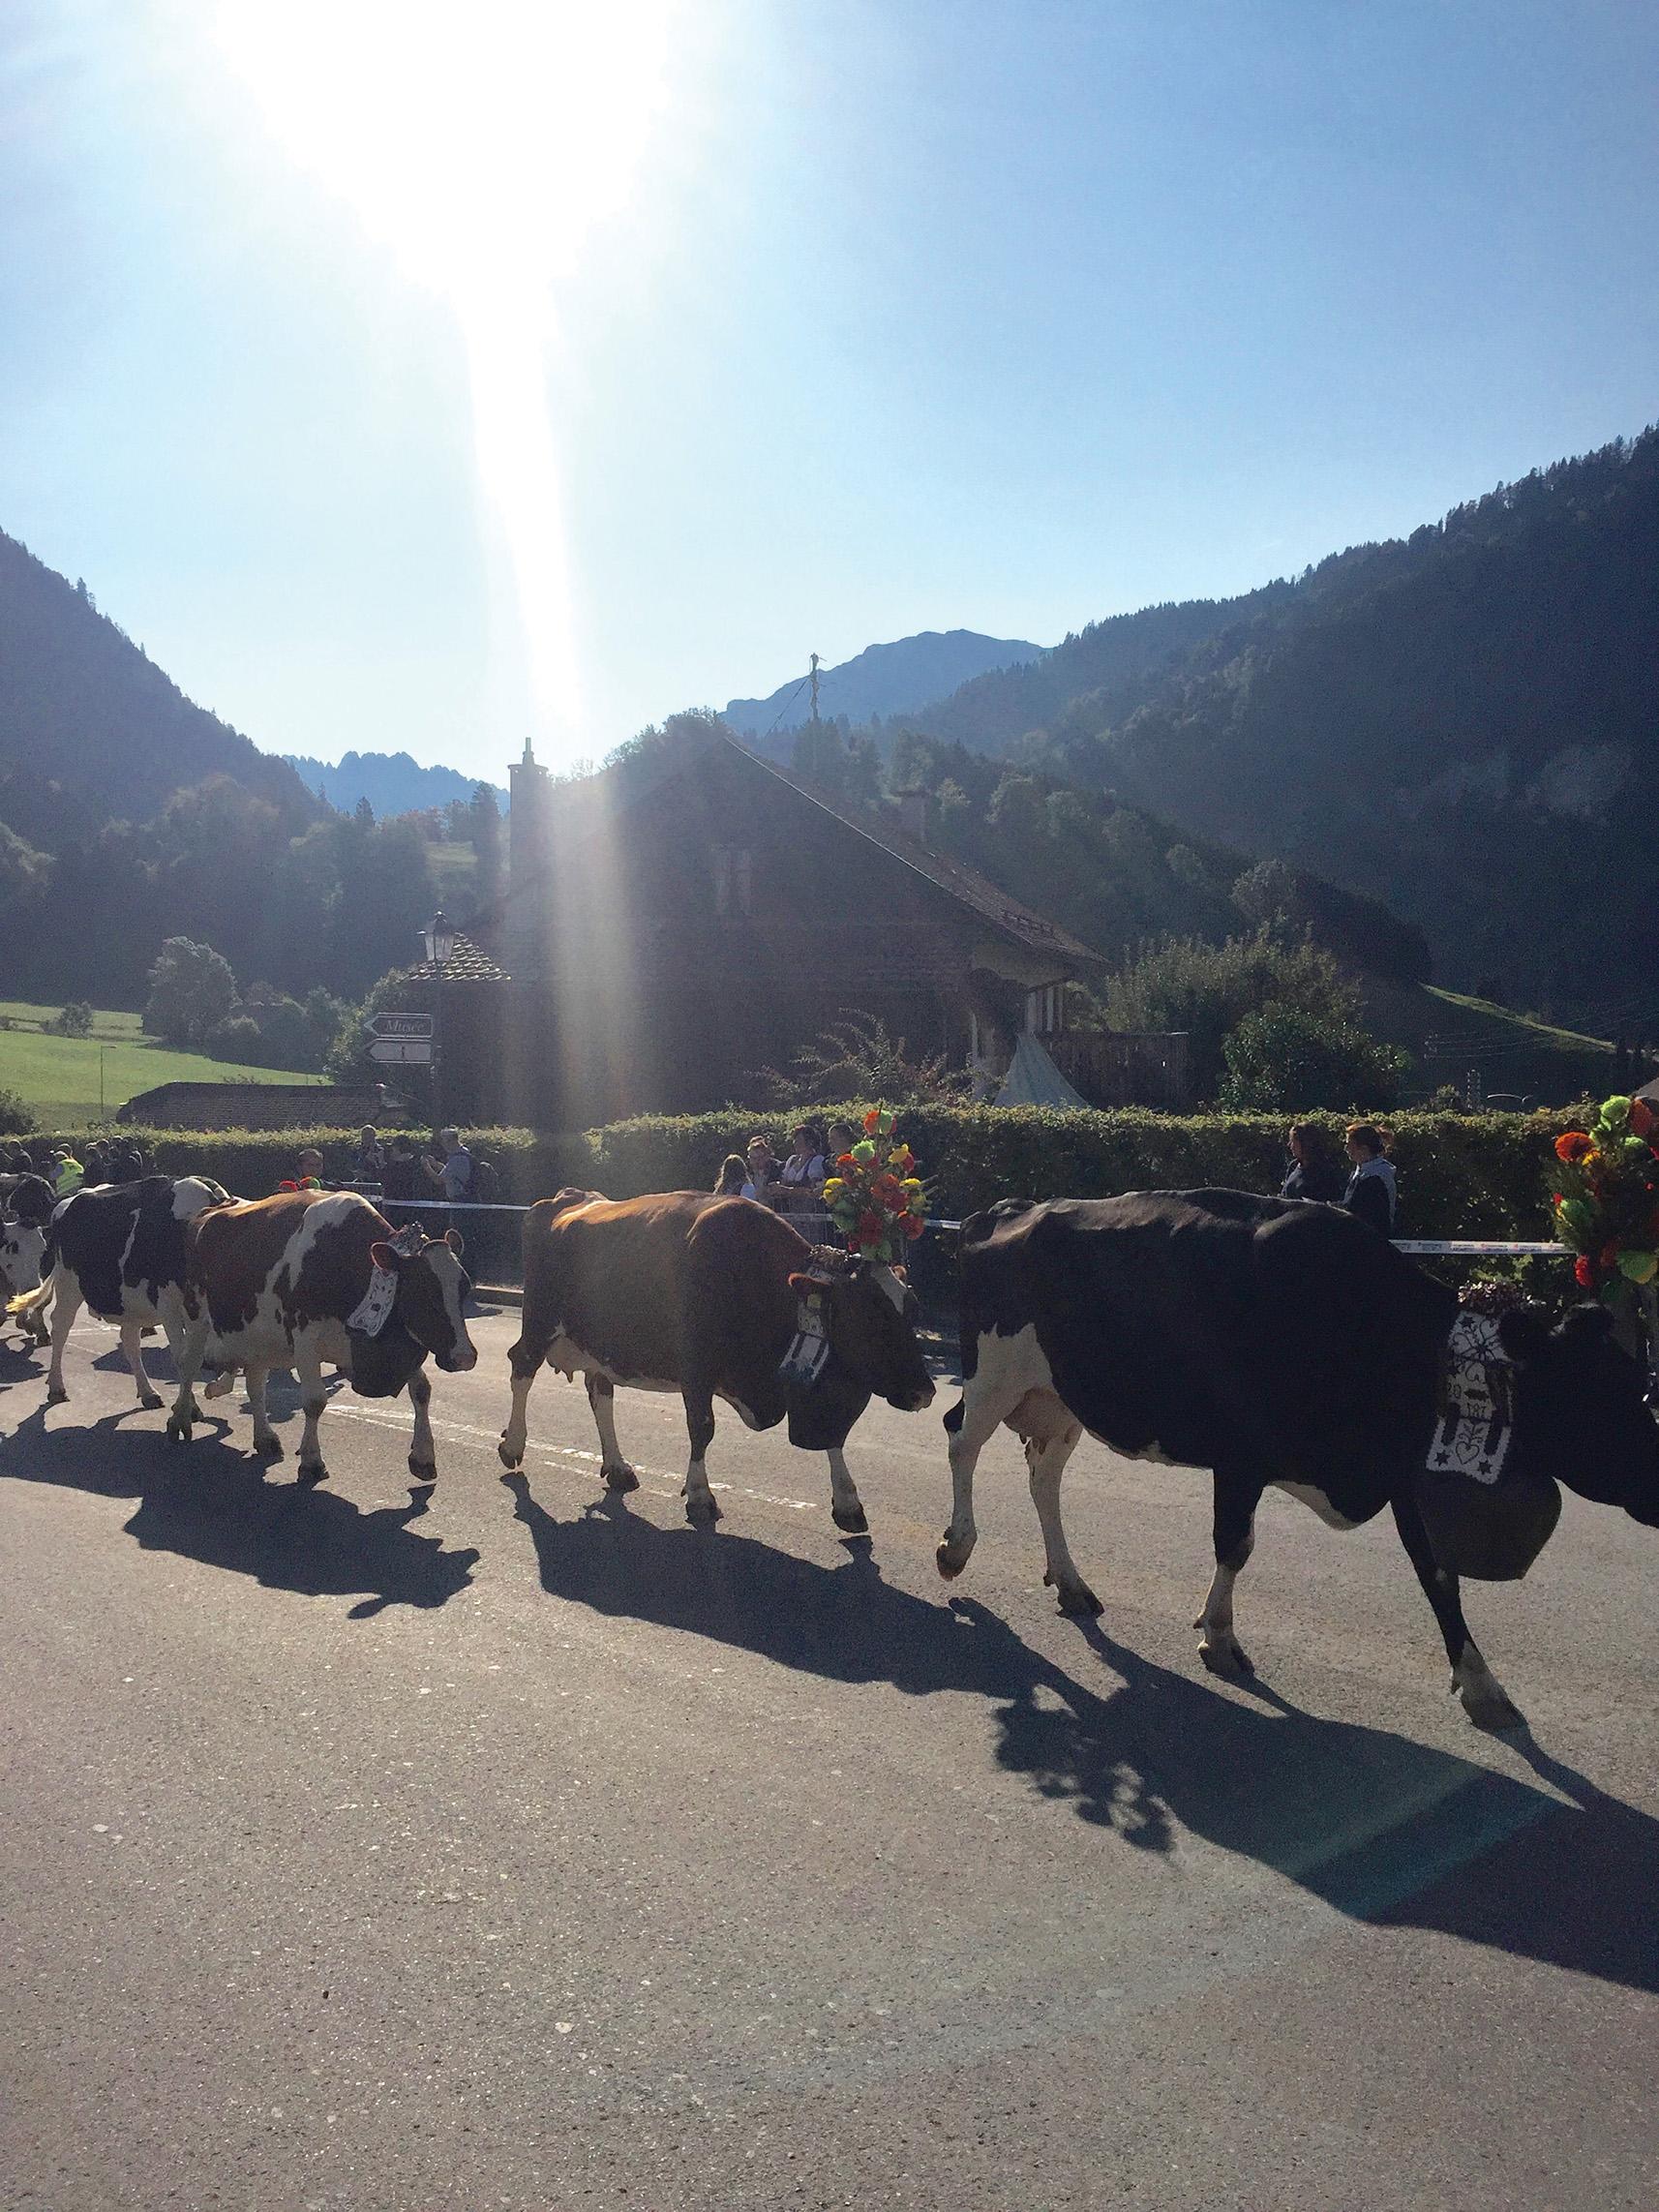 Cows on parade at Desalpes.